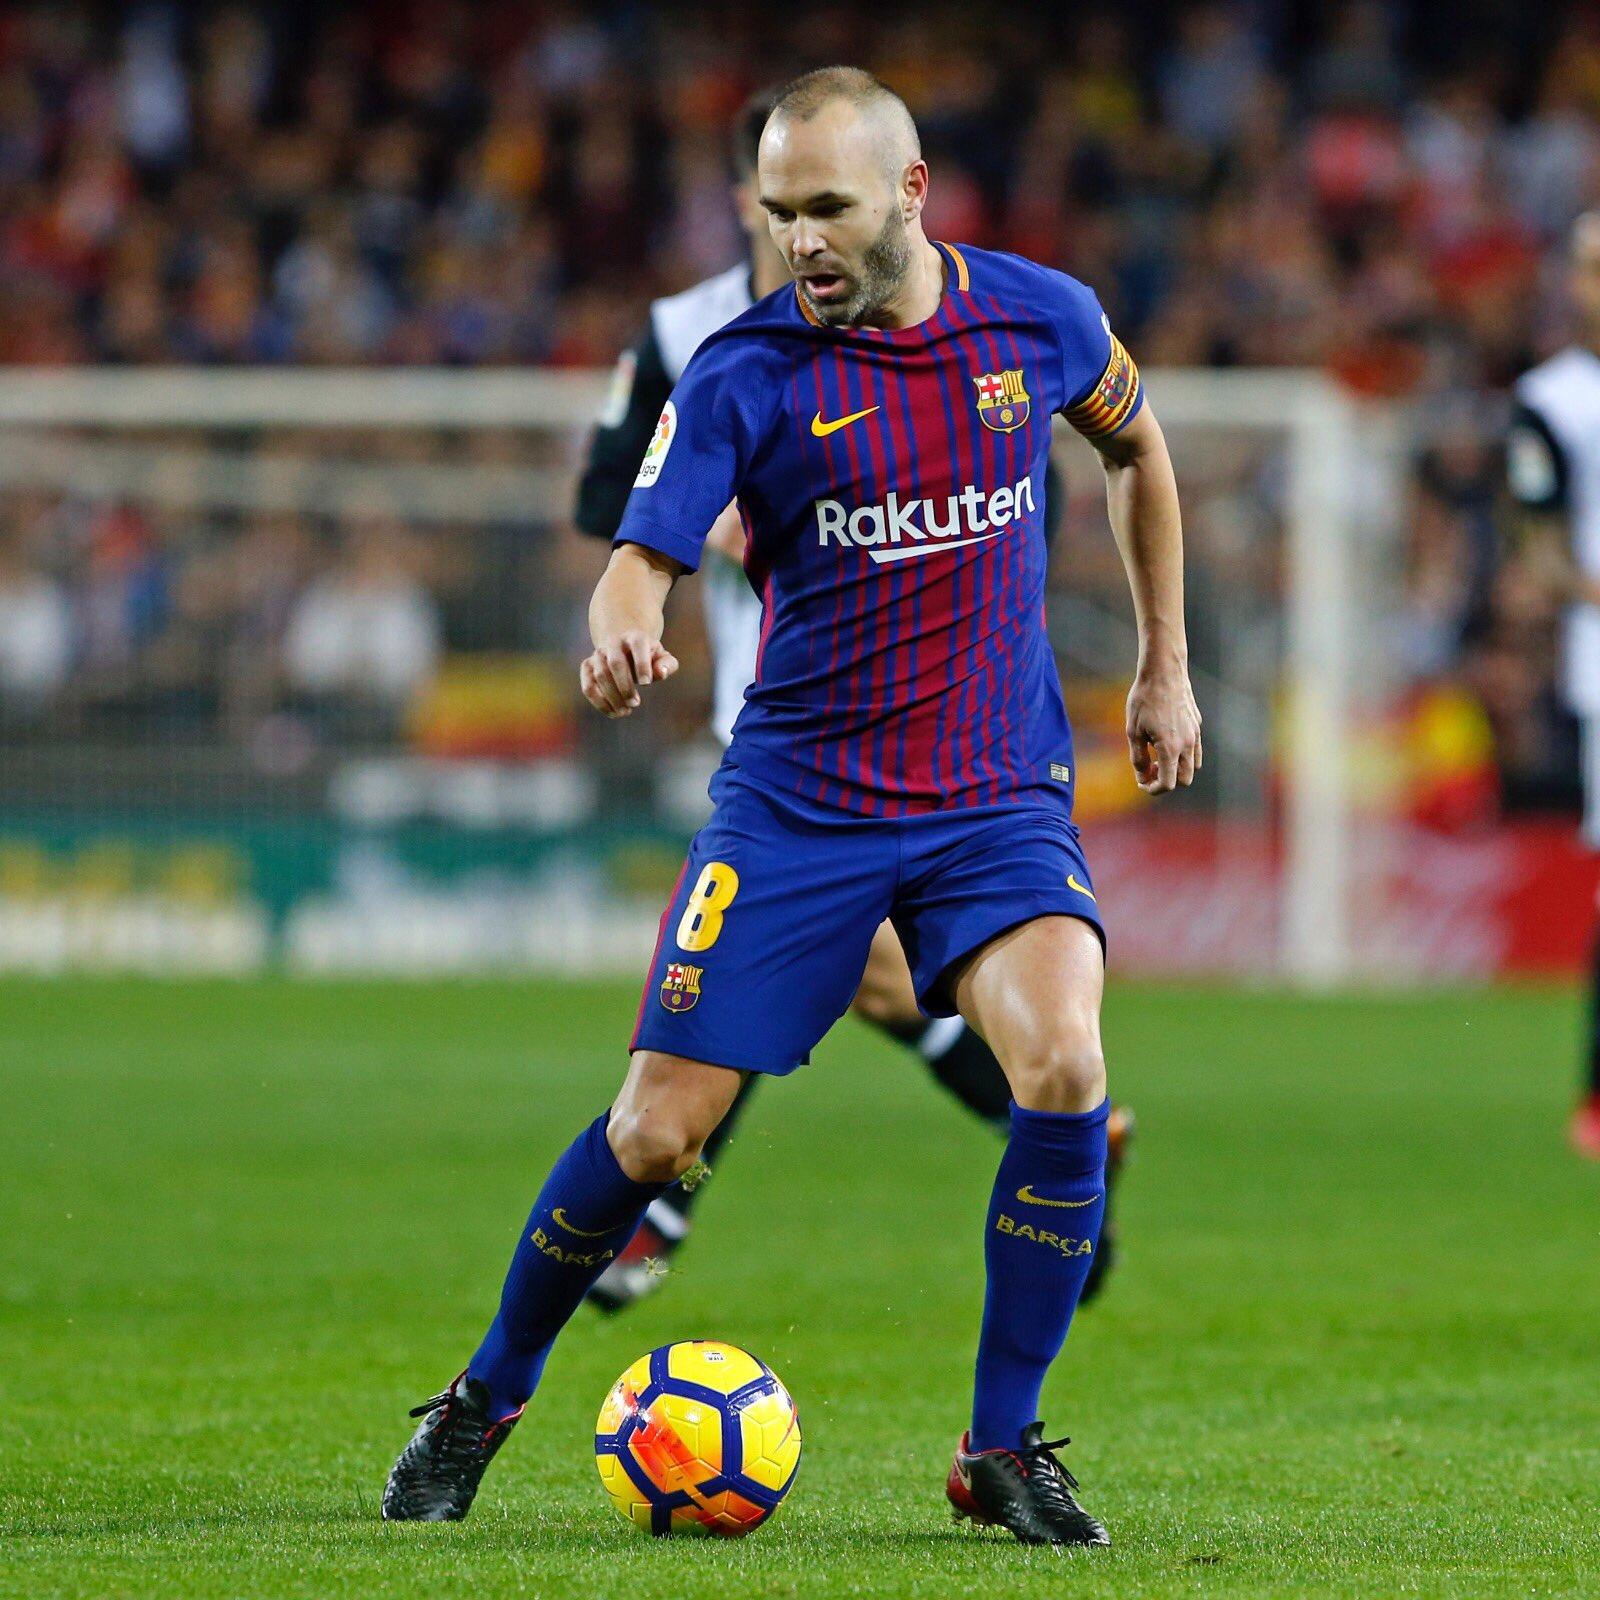 Seguimos sumando, hoy en un campo muy difícil! Força Barça!!������������ https://t.co/GPJJ0NhQu5